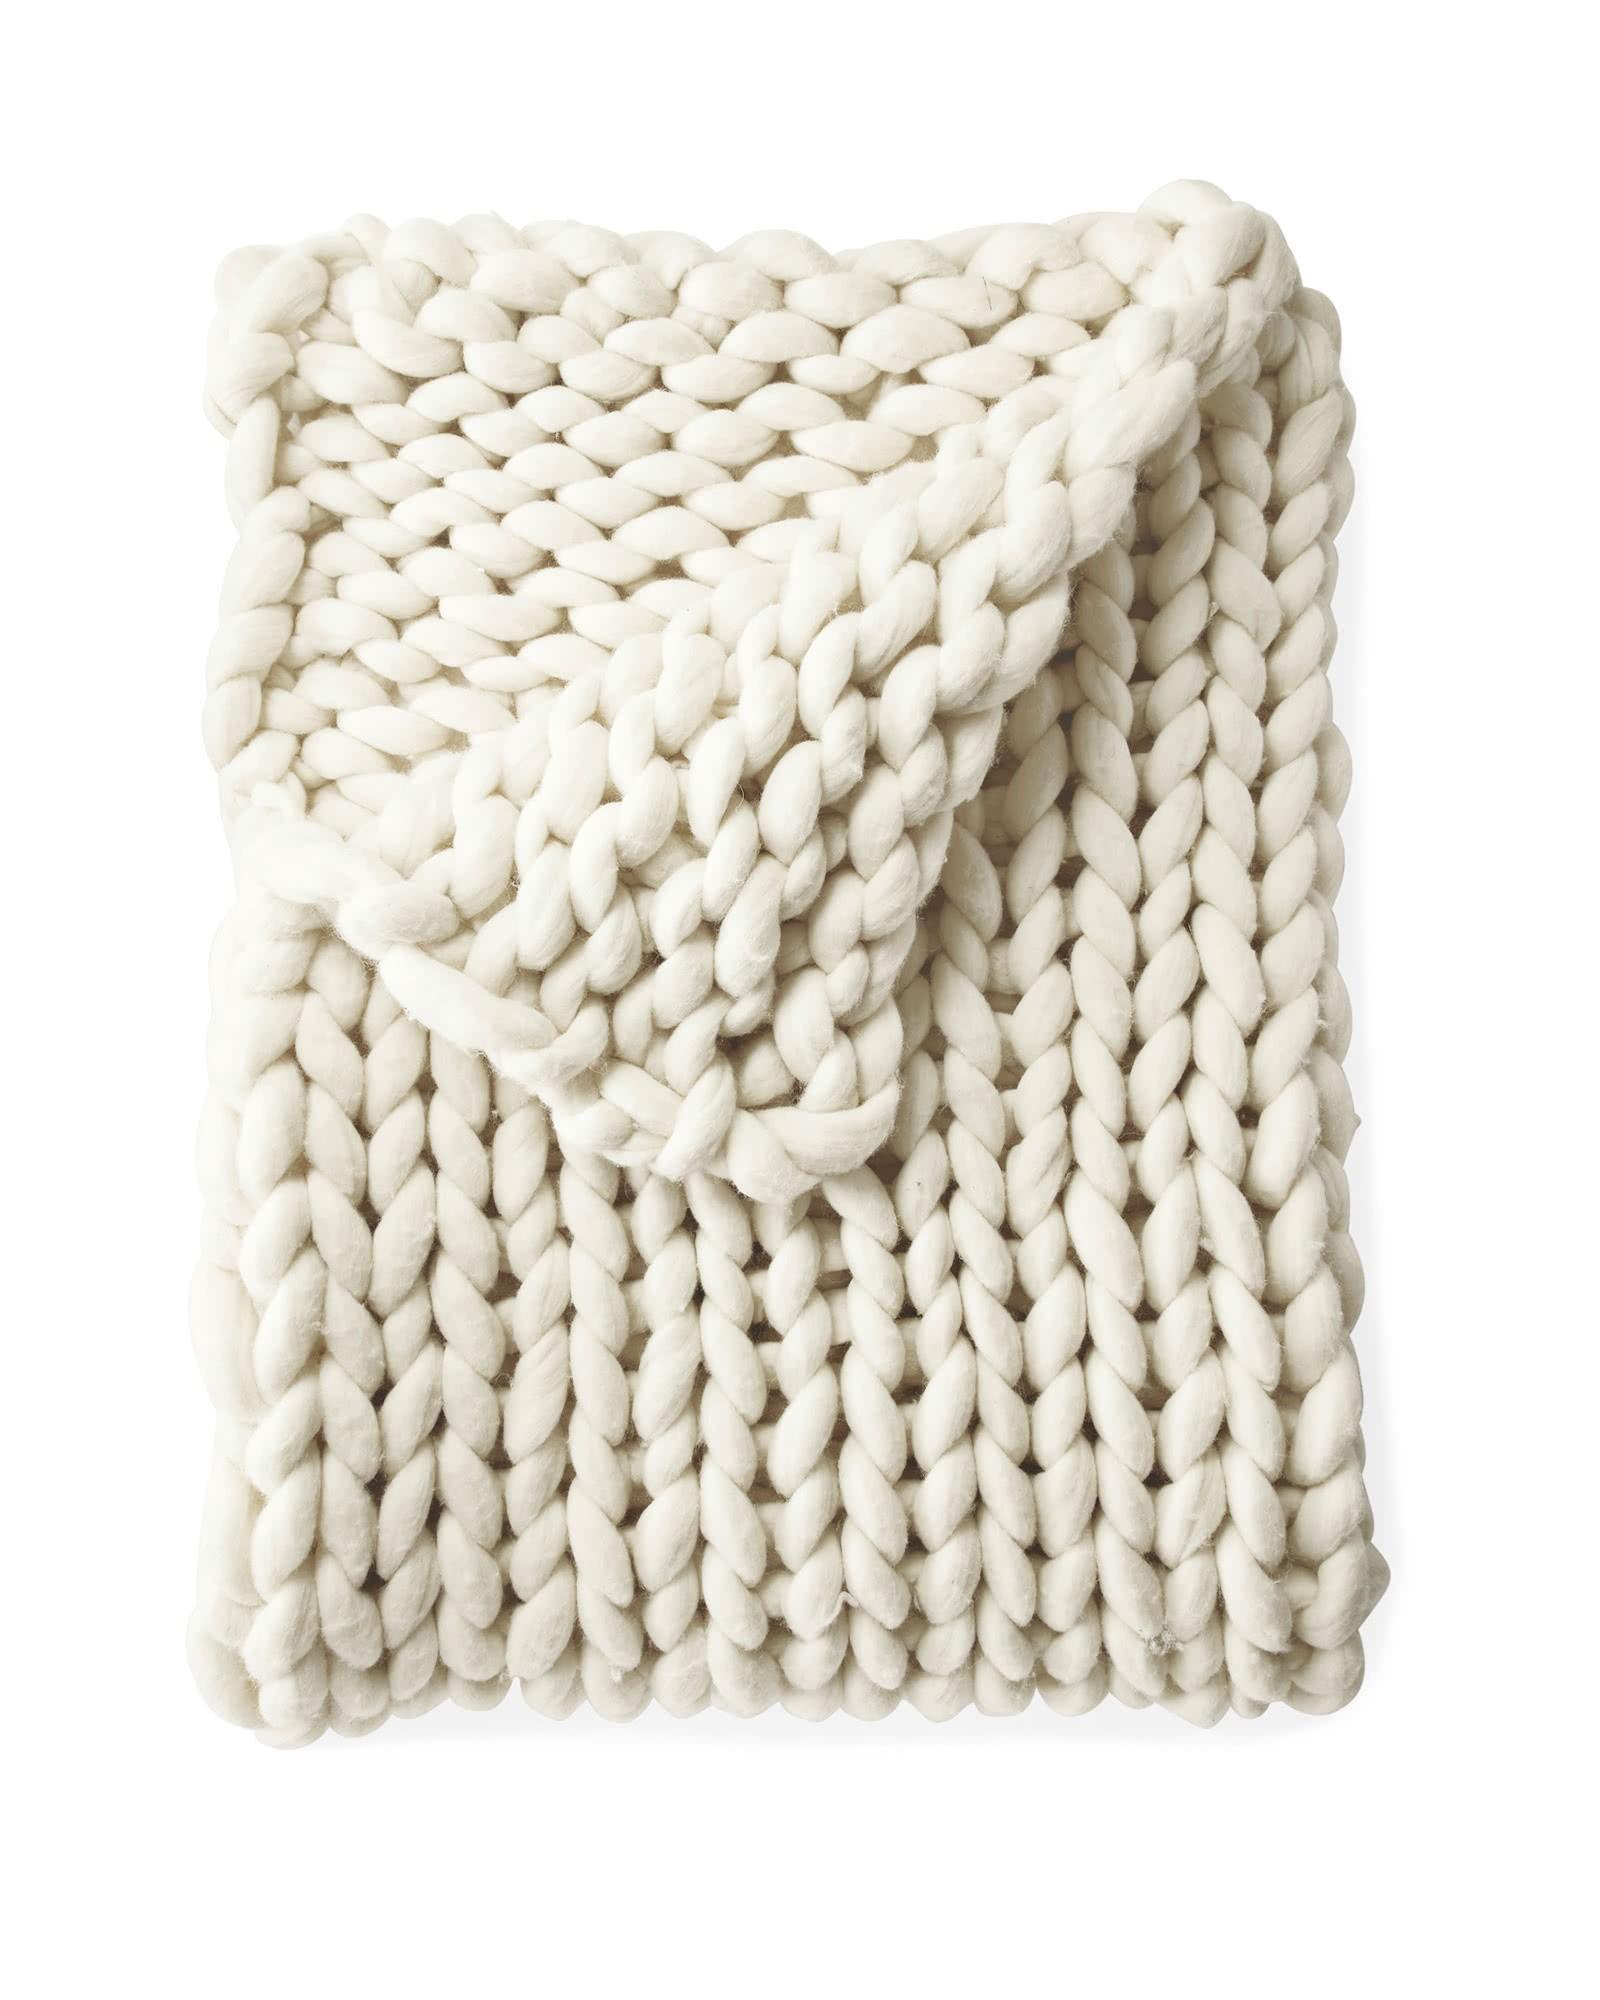 Bedding Popular Brand Parachute Windowpane Alpaca Throw In Ivory And Black In Short Supply